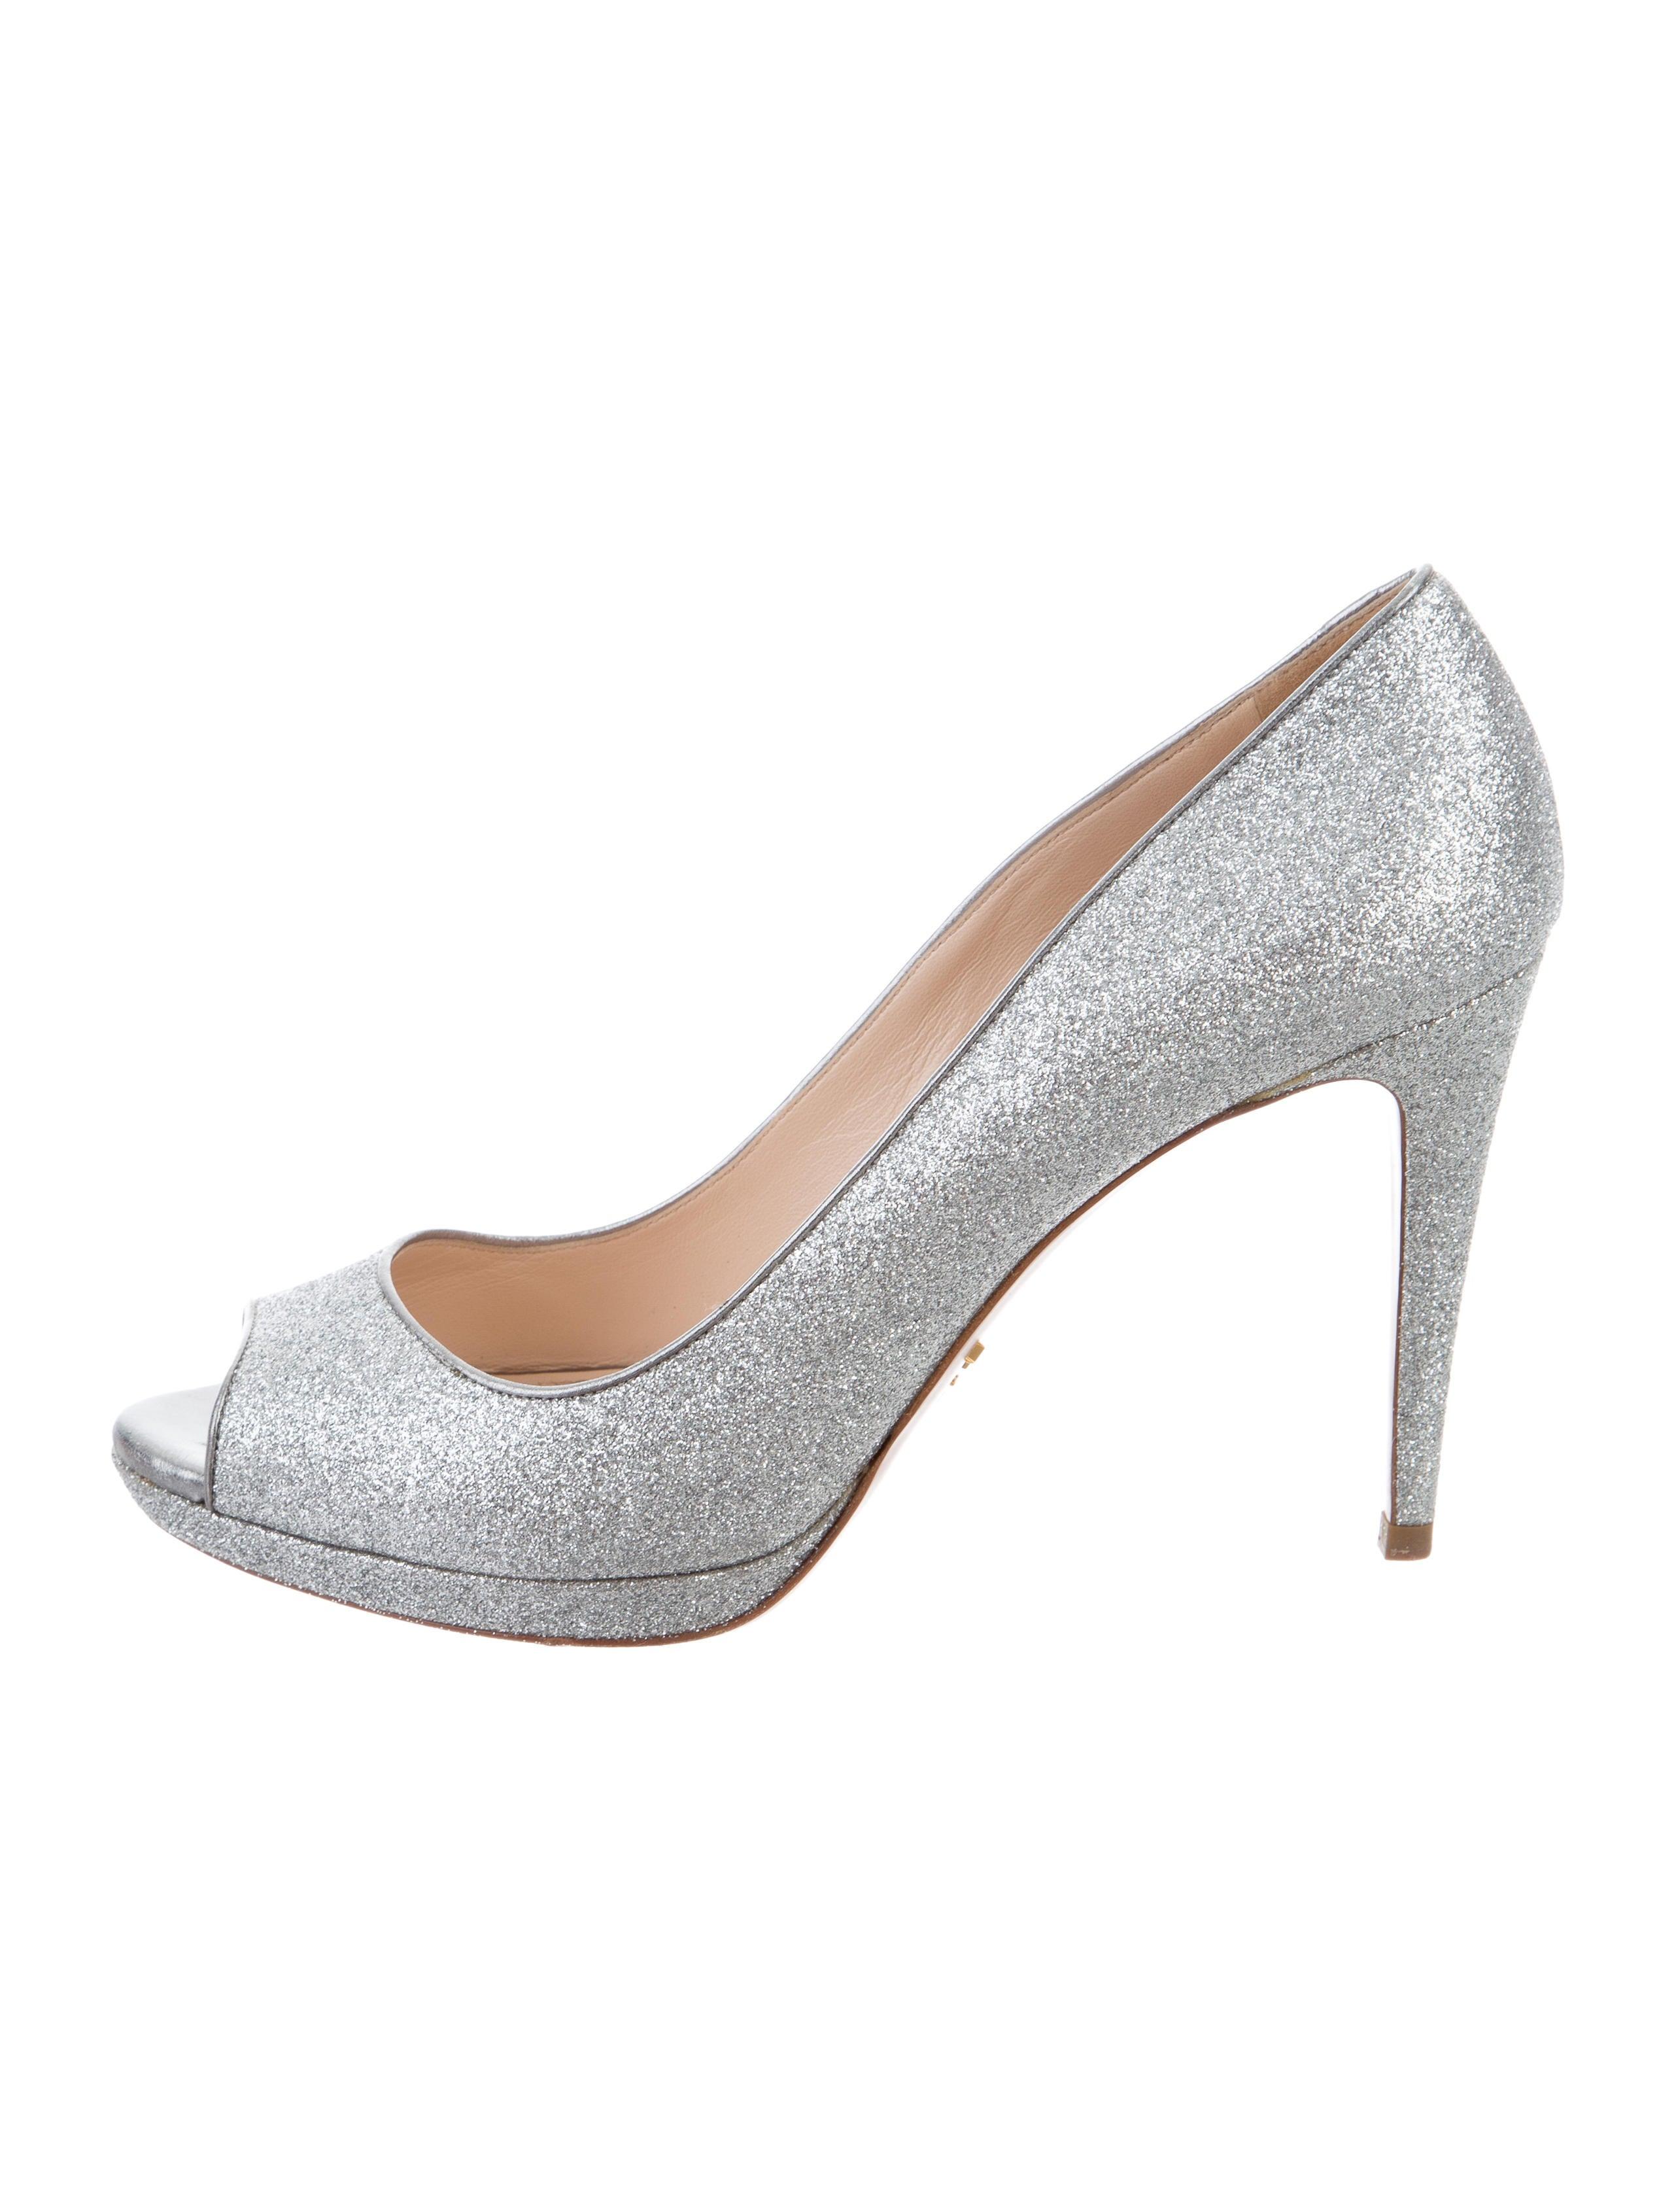 cheap price wholesale browse cheap price Prada Glitter Peep-Toe Pumps cheap top quality d1jzWe